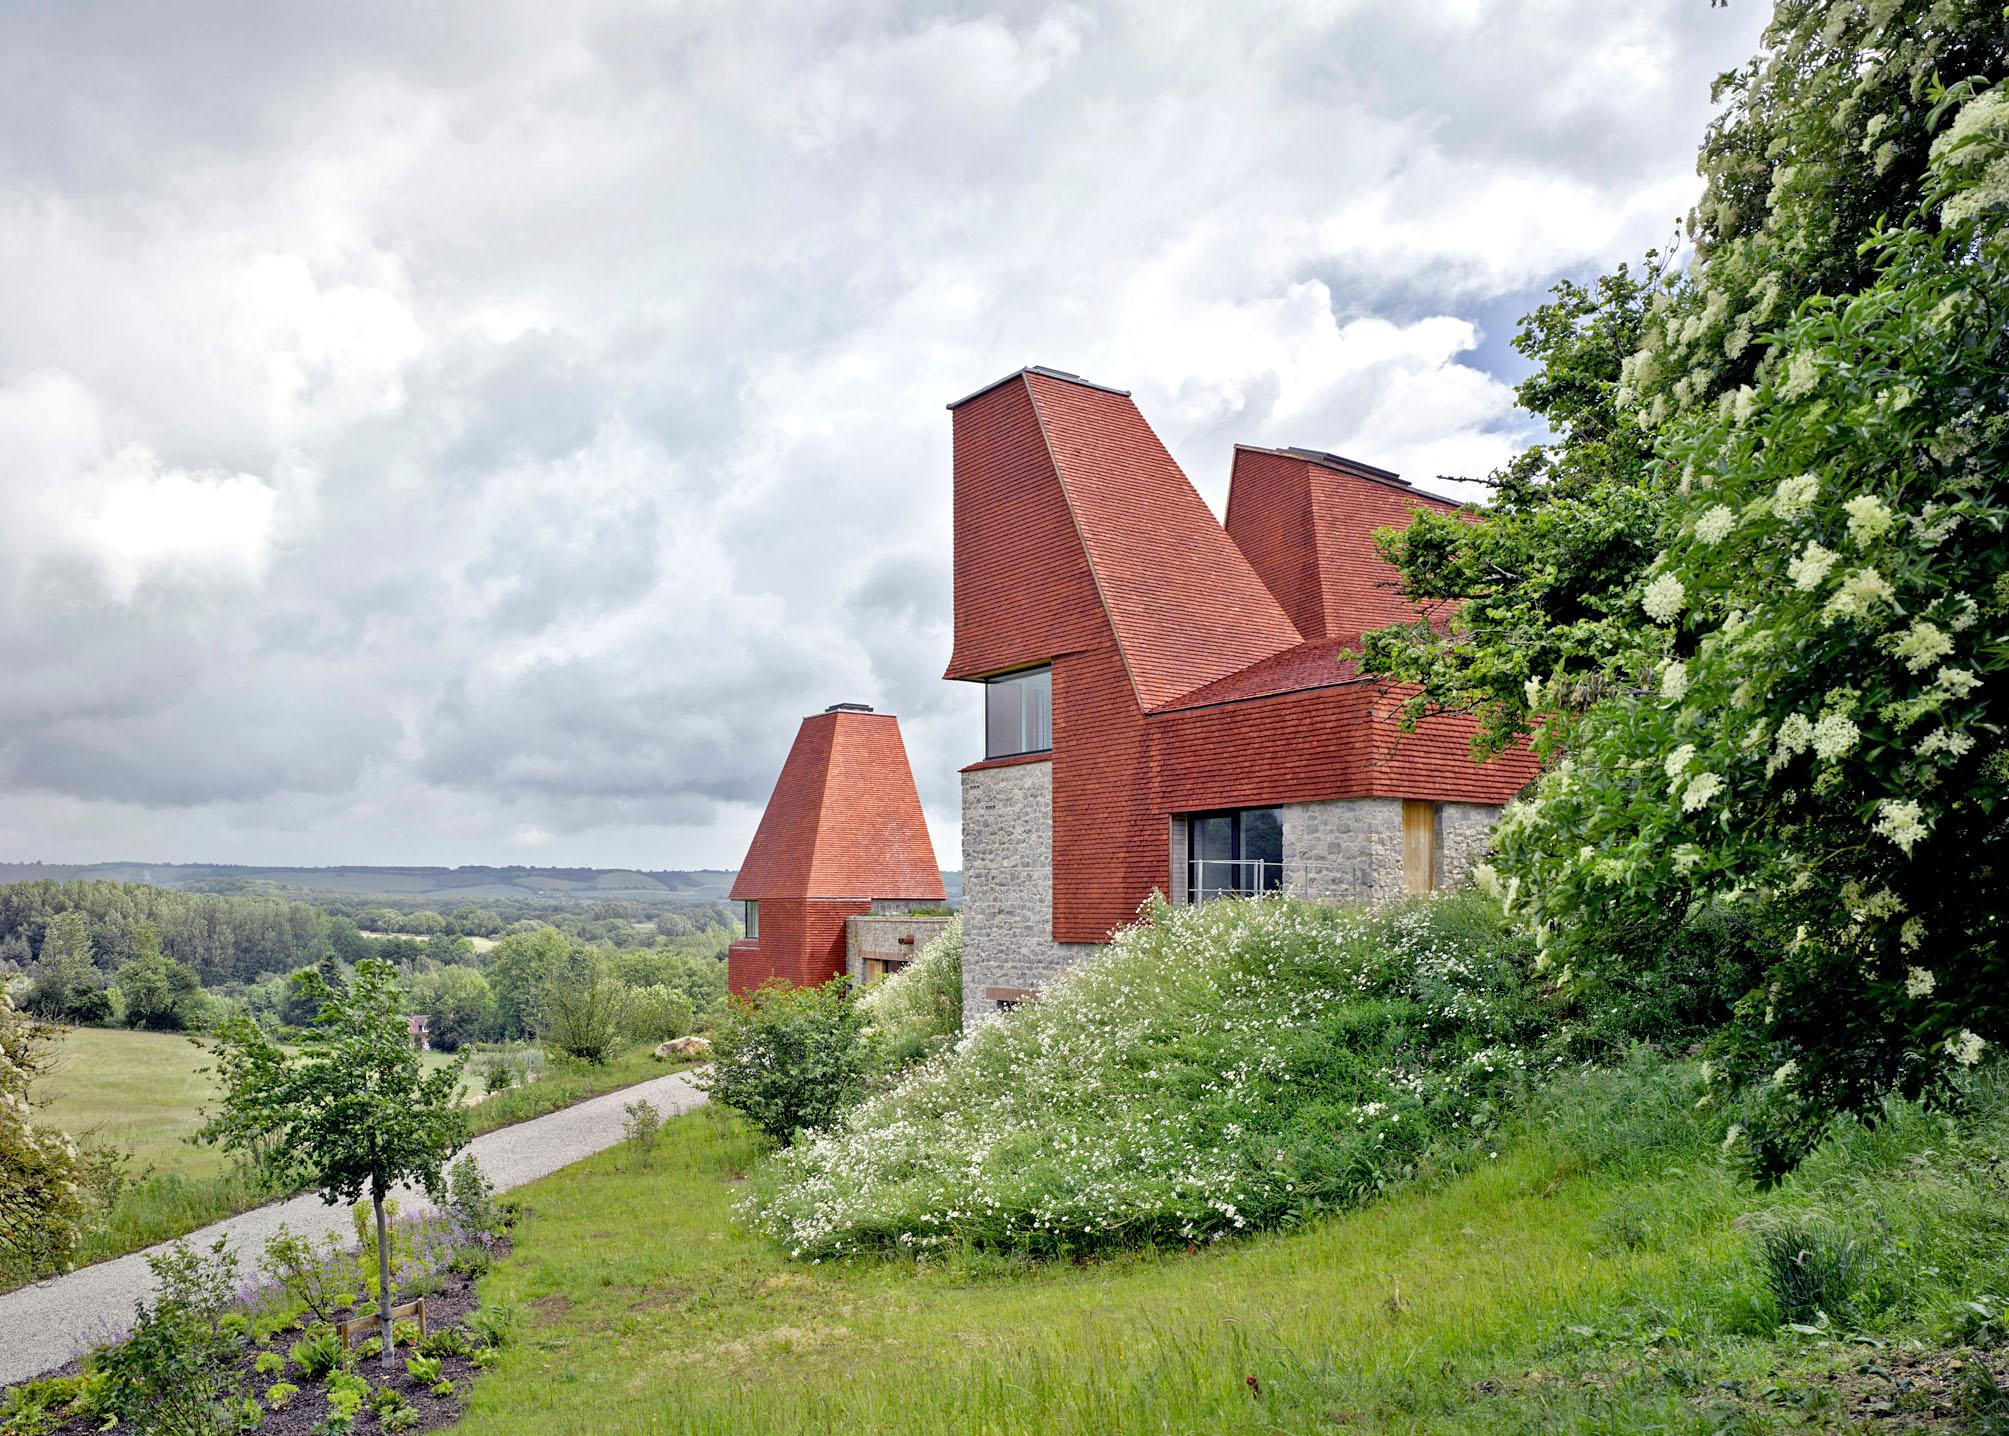 Caring Wood RIBA House of the year 2017